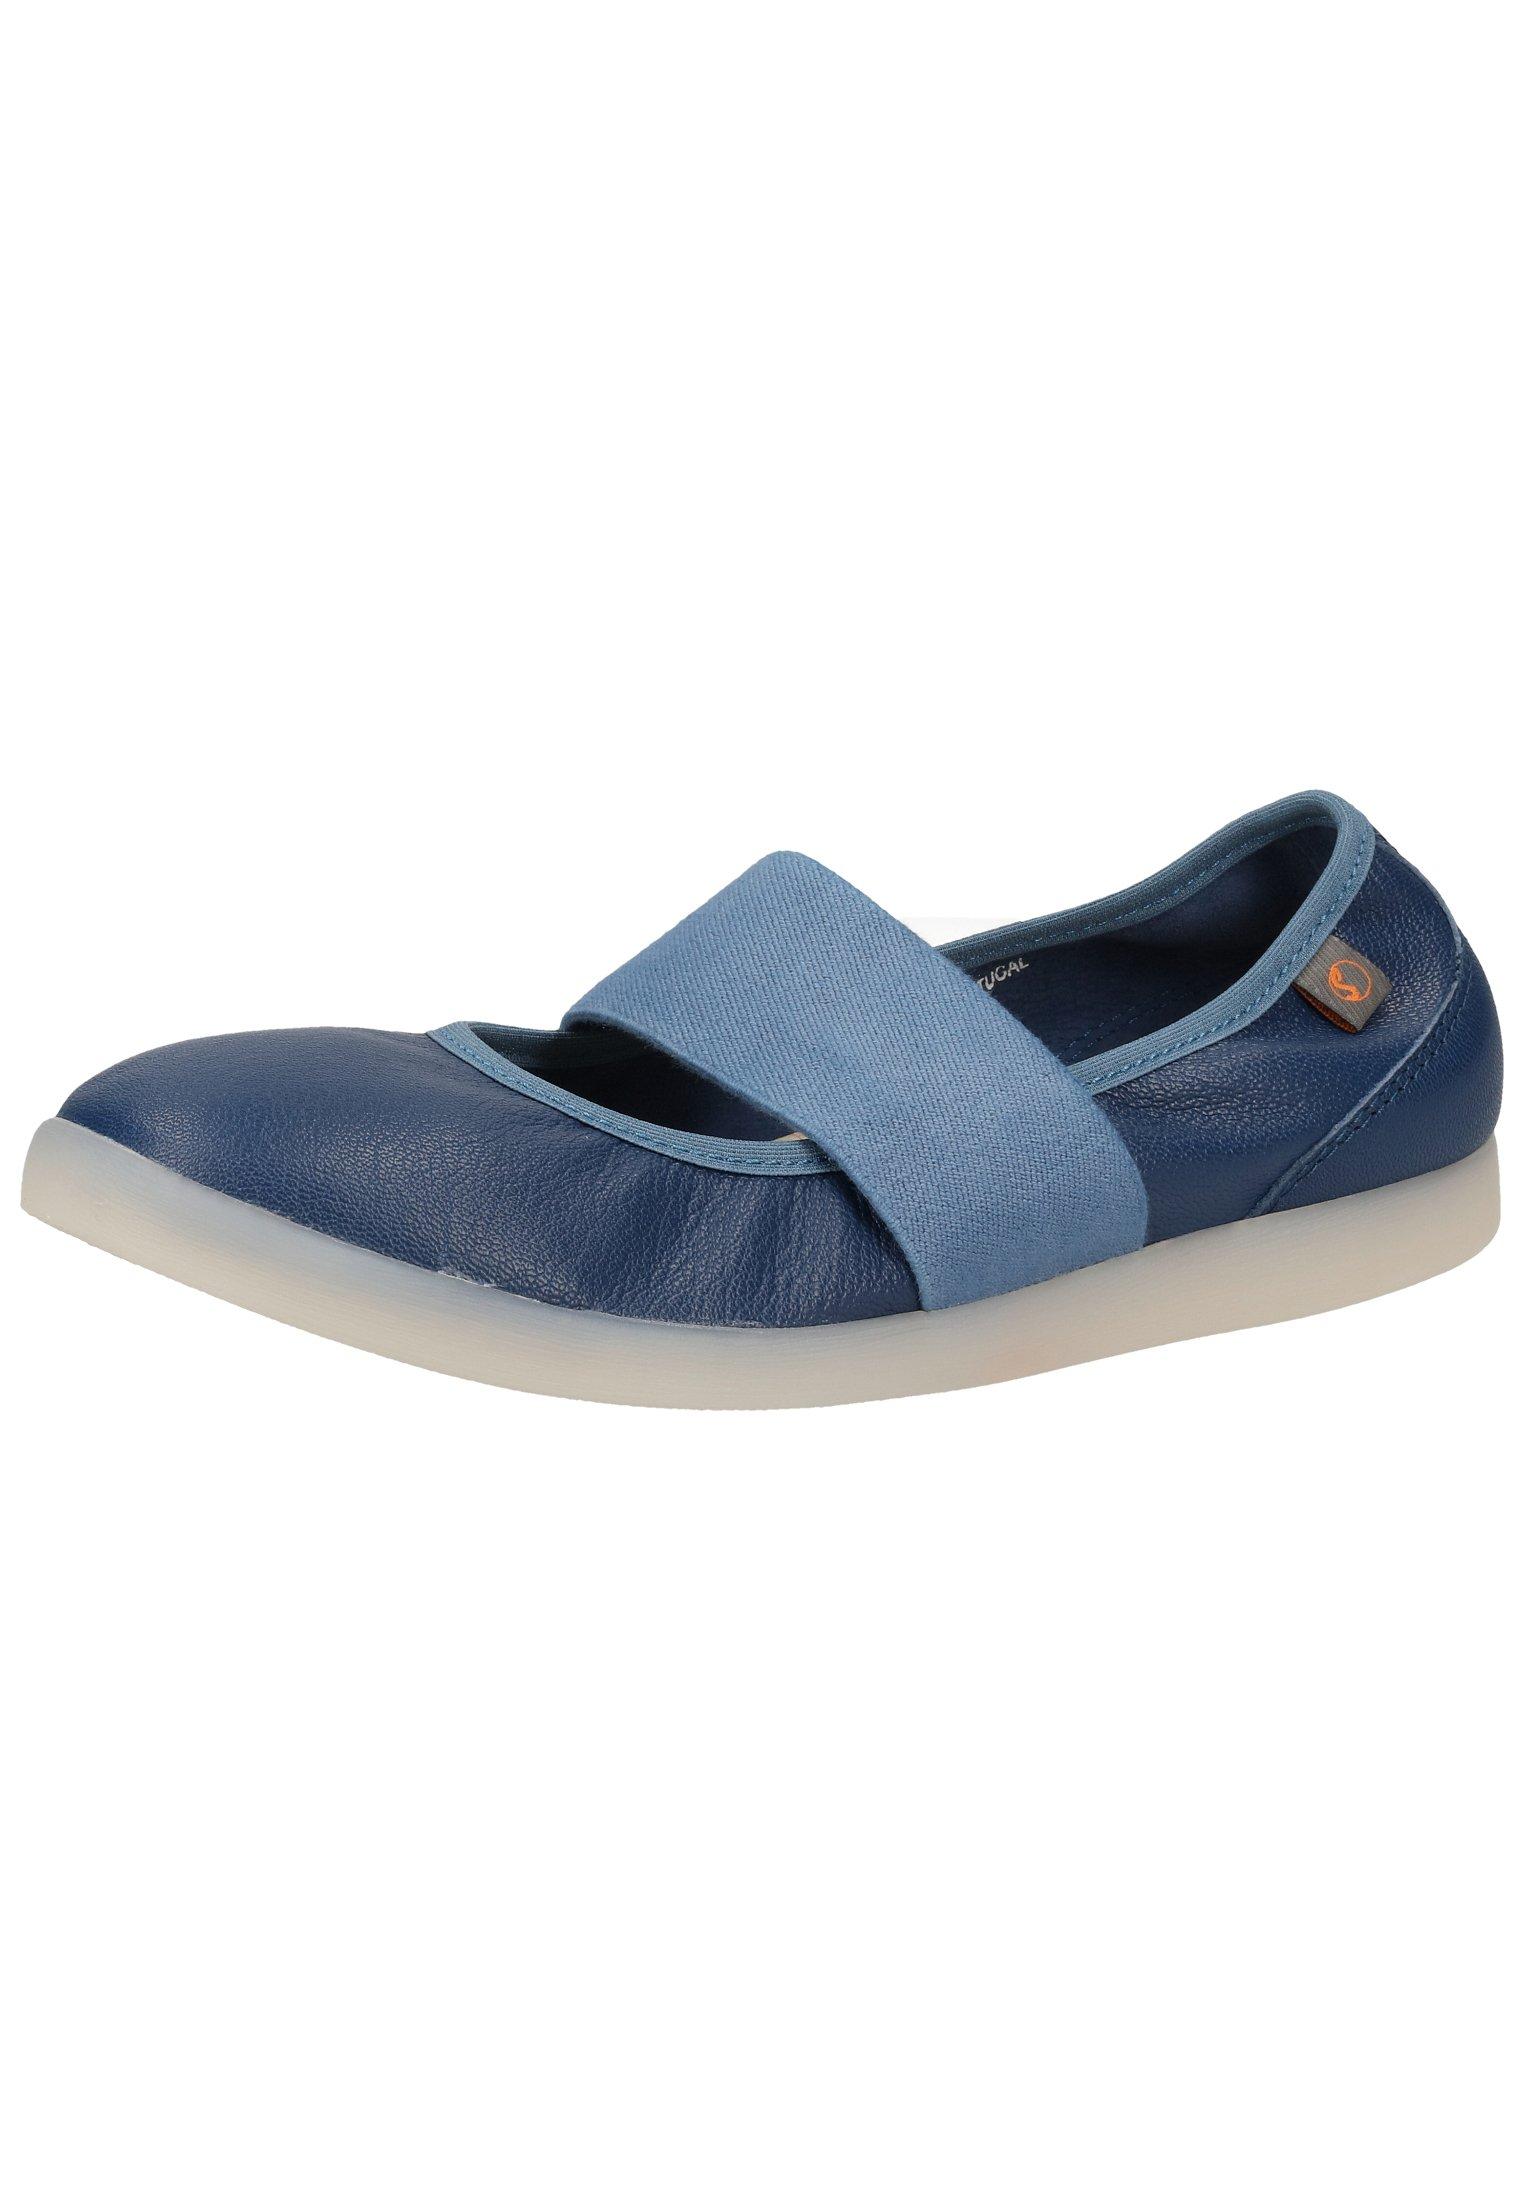 Softinos Baleriny - blue